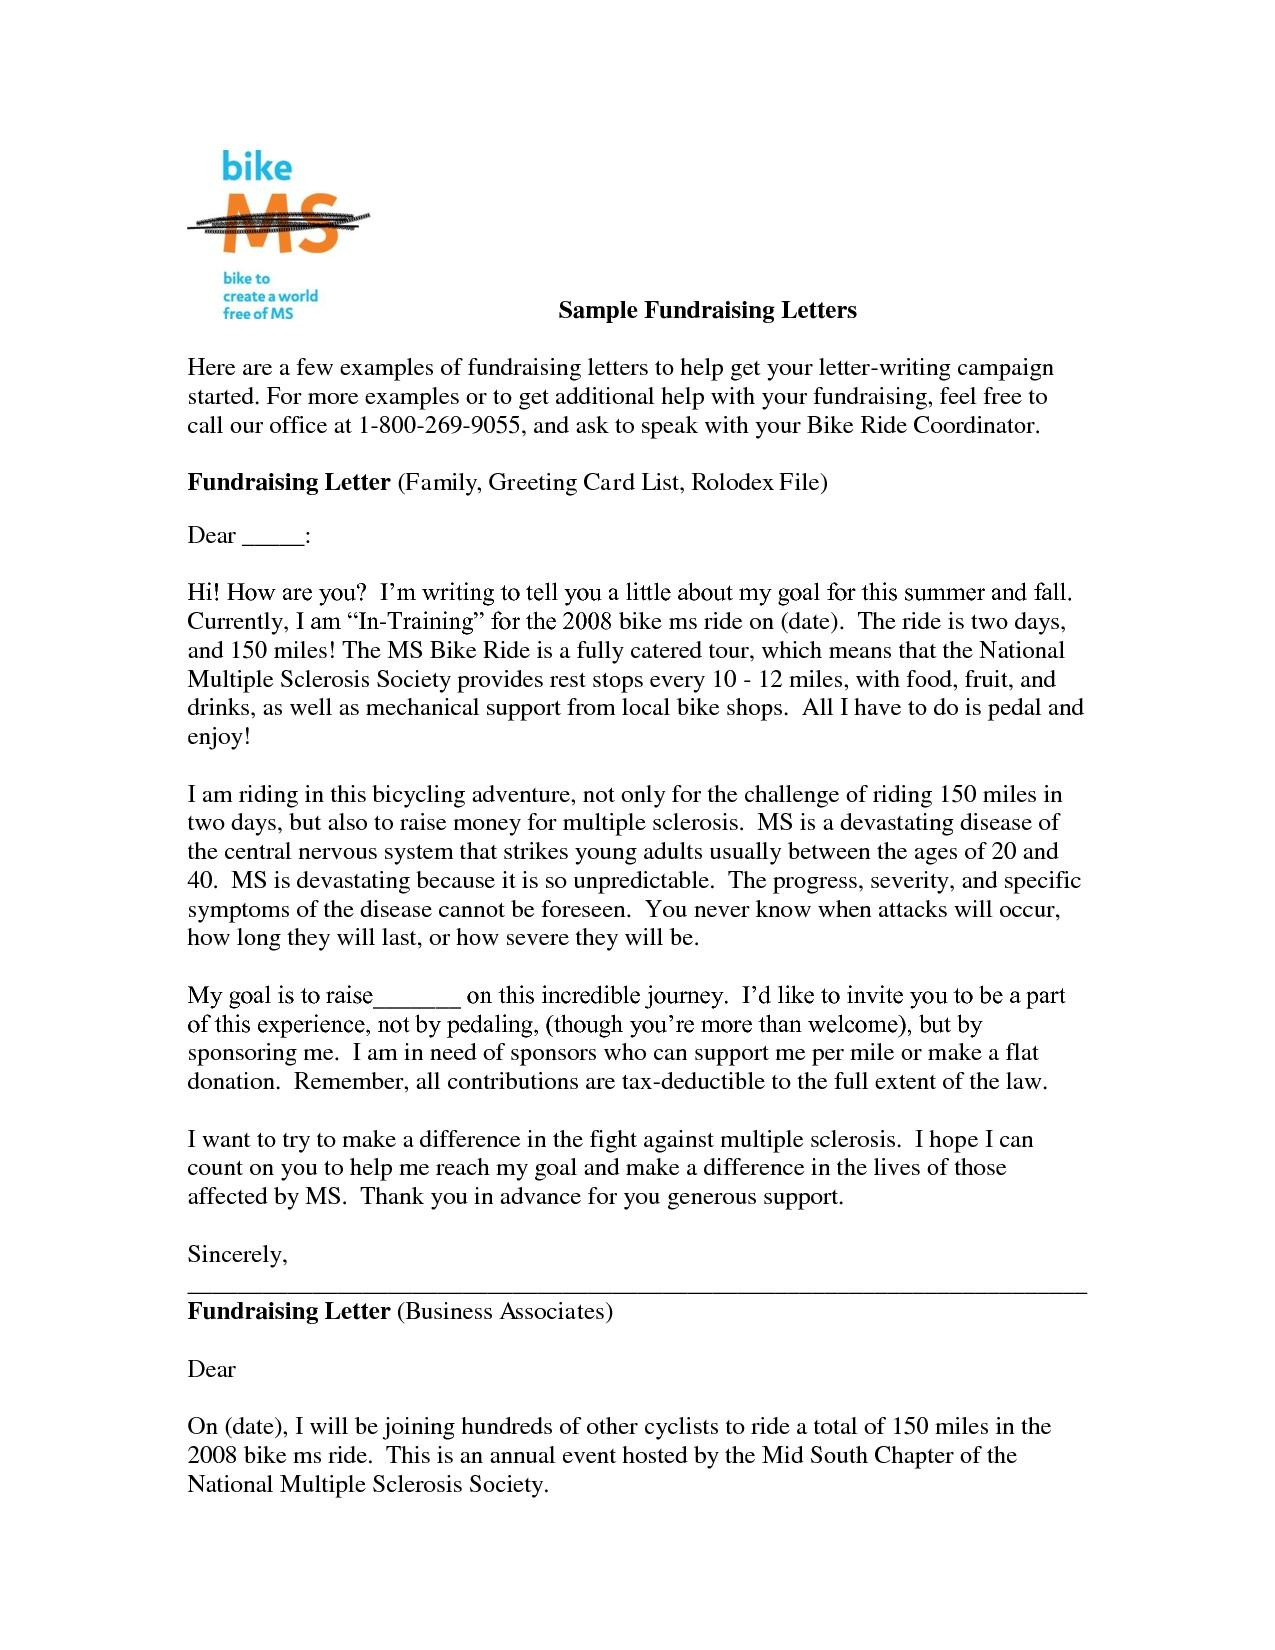 Fundraiser Donation Letter Template